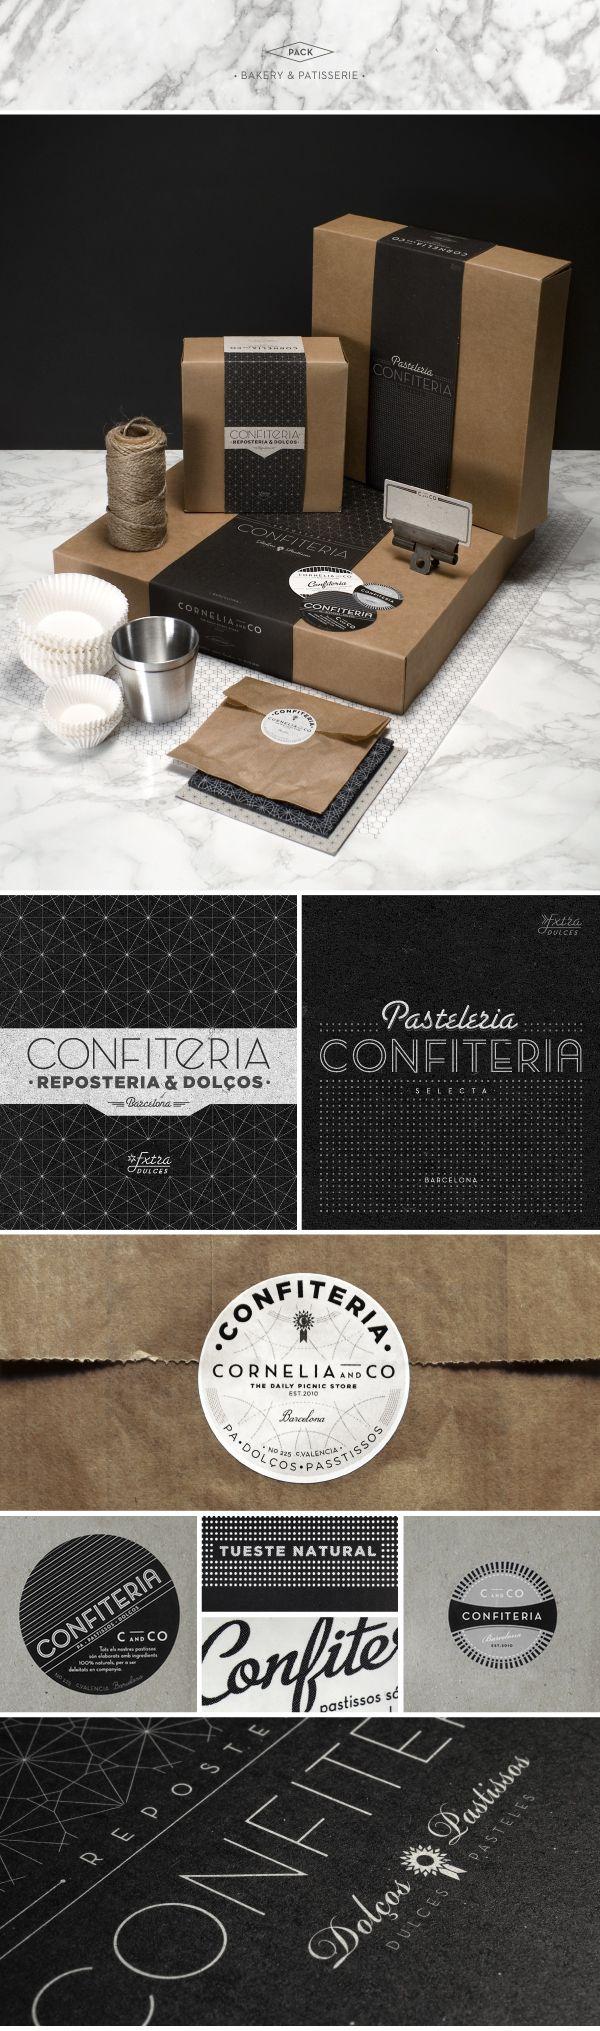 CORNELIA and CO [ Brand identity & Packaging ] by Oriol Gil, via Behance   #stationary #corporate #design #corporatedesign #identity #branding #marketing < repinned by www.BlickeDeeler.de   Take a look at www.LogoGestaltung-Hamburg.de